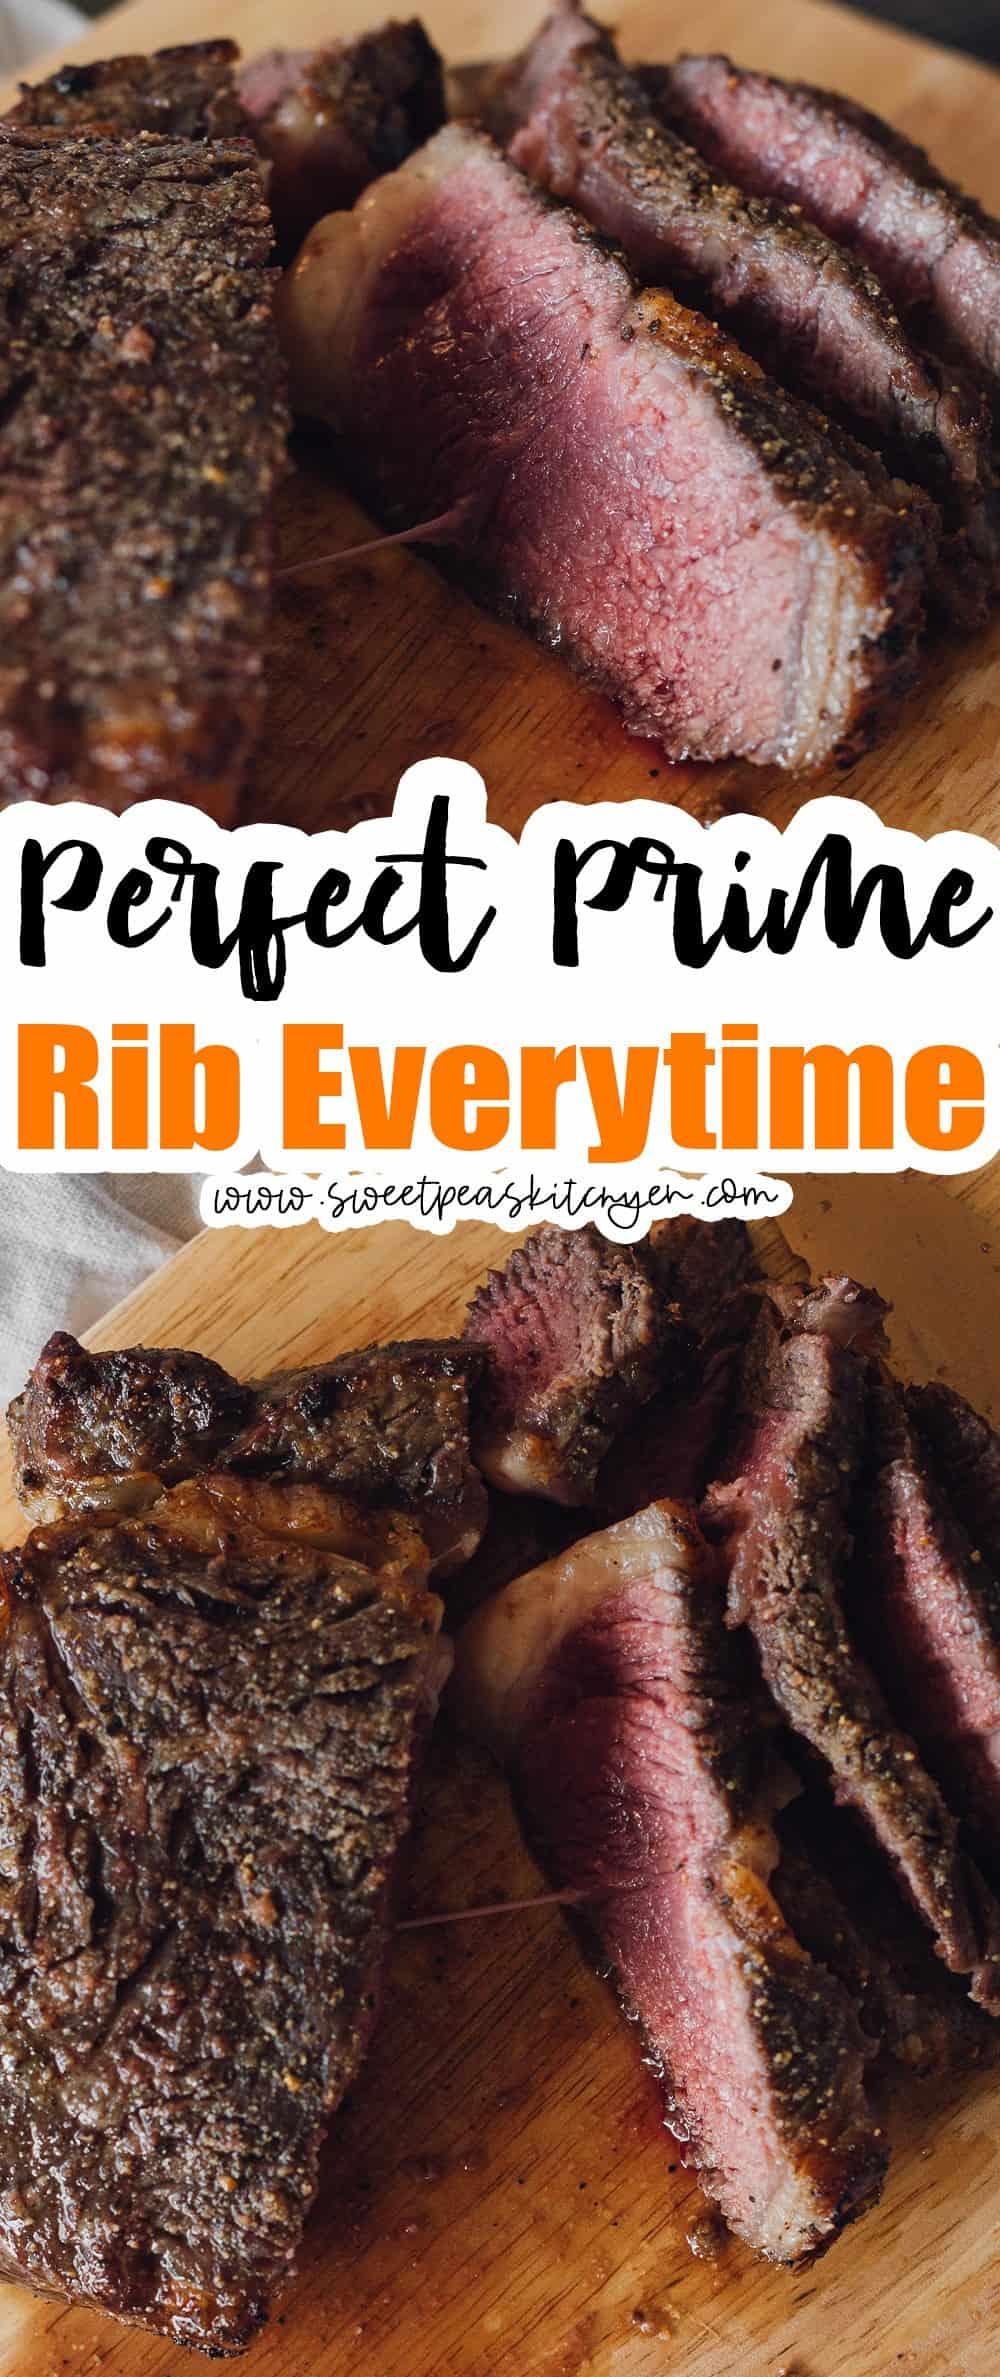 Perfect Prime Rib Everytime